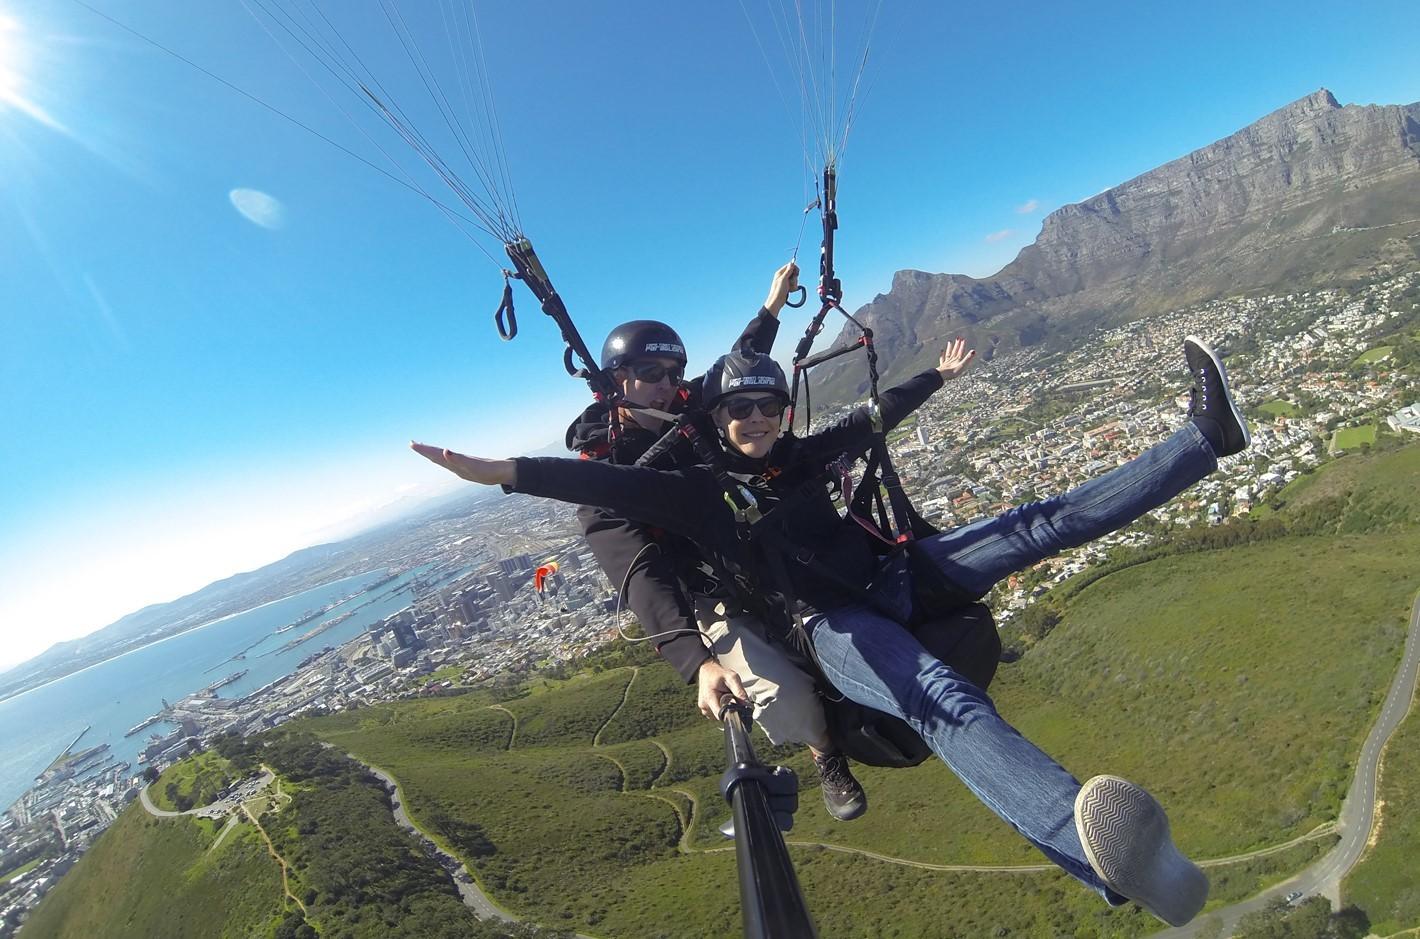 paragliding-activities-cape-town